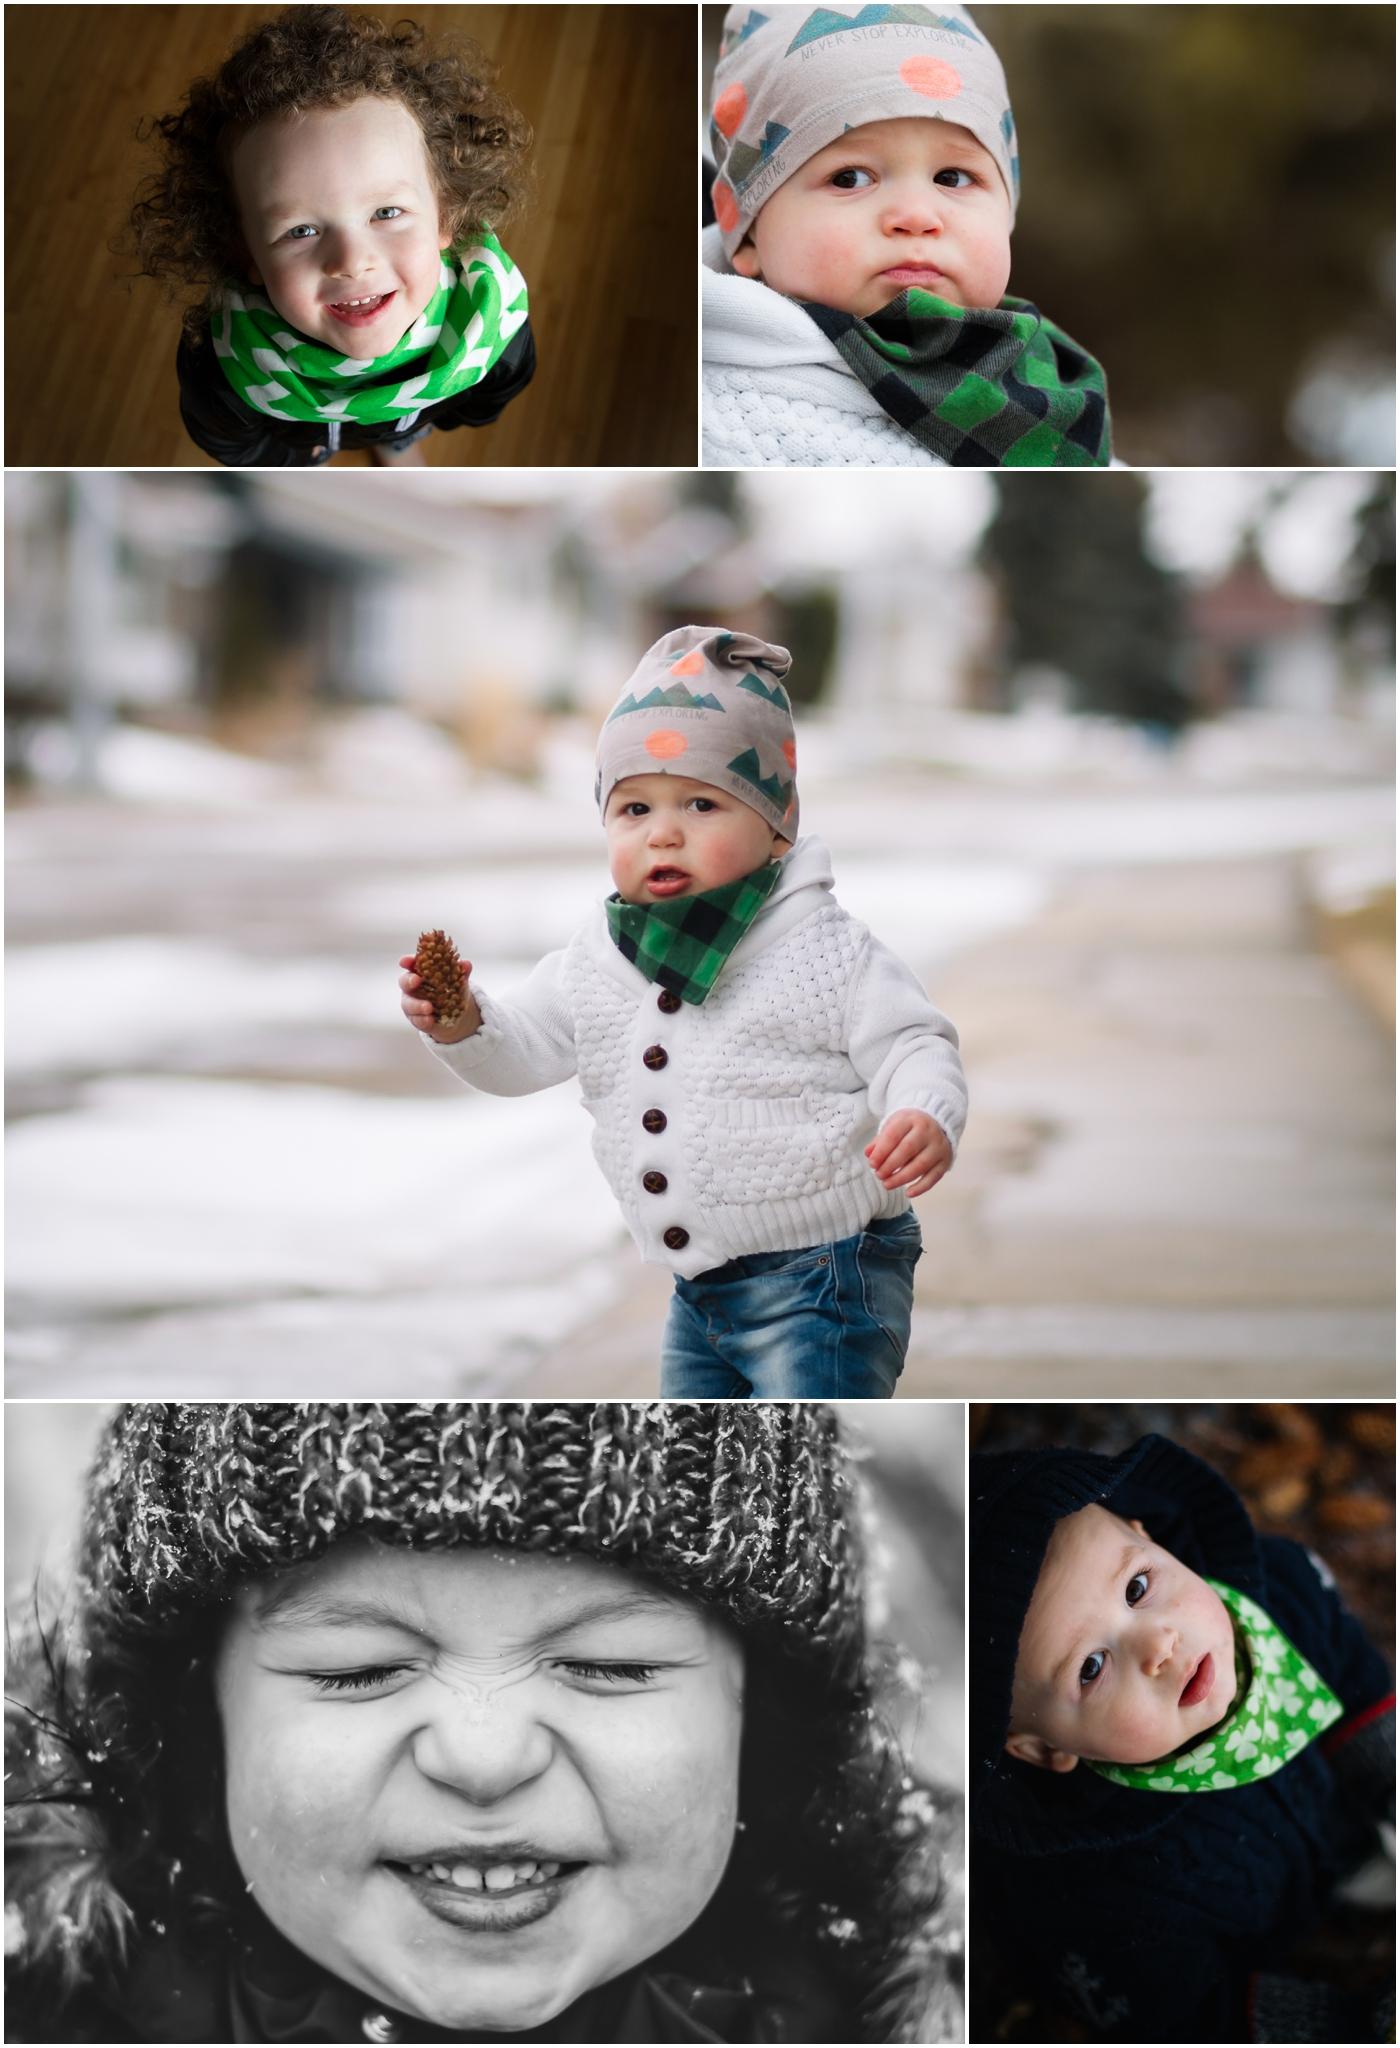 Edmonton Child and Family Photographer - Best of 2016 - Lifestyle Winter